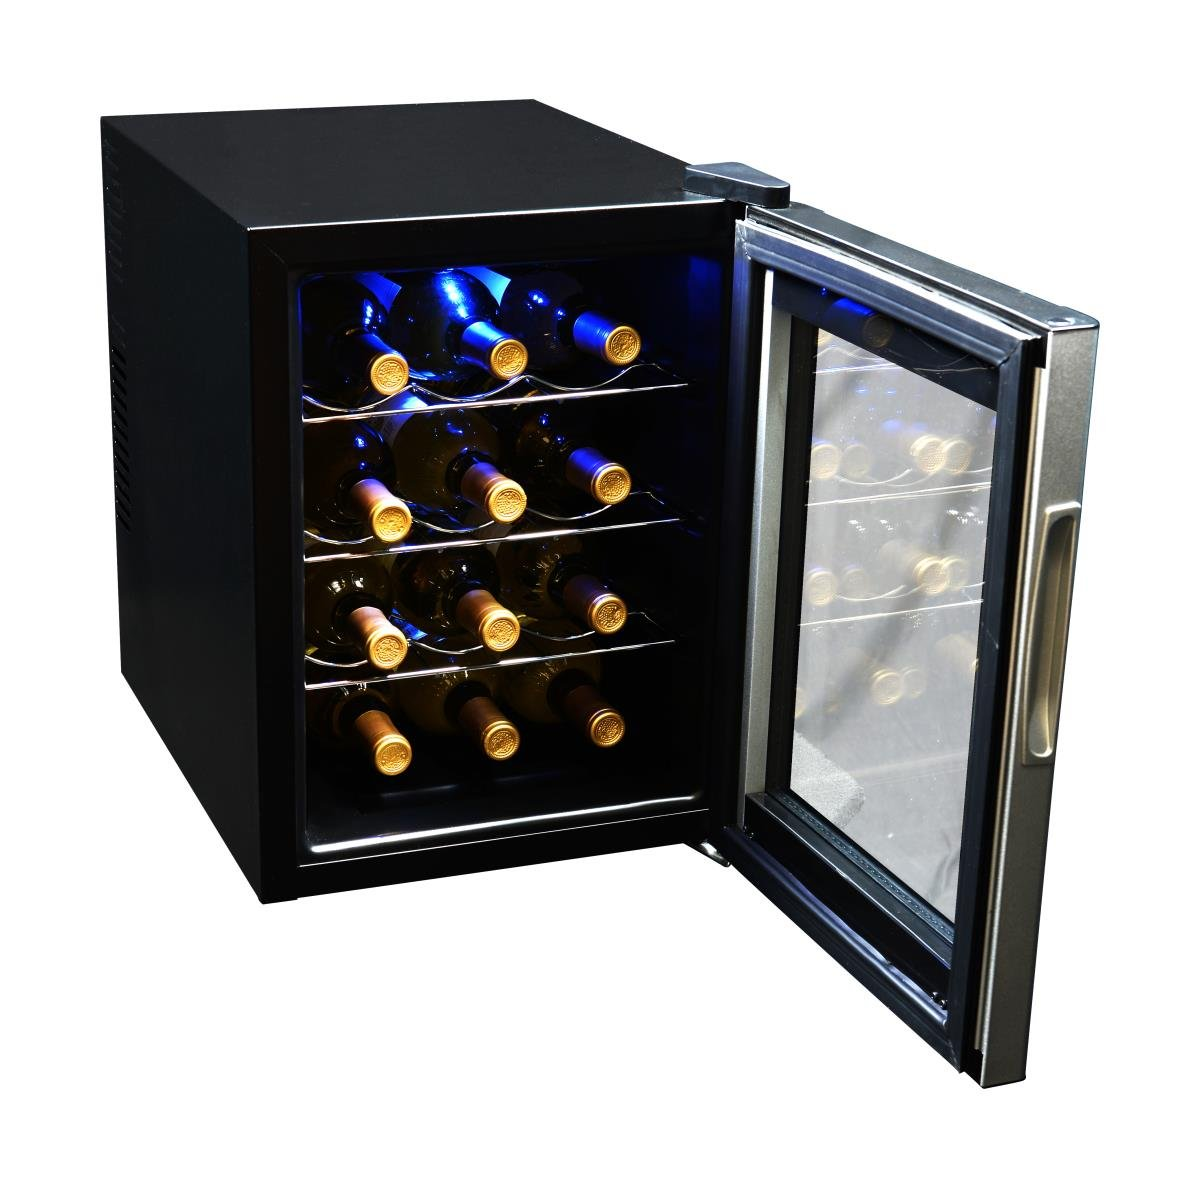 Avalon Bay AB-WINE12S 12 Bottle Single Zone Wine Cooler by Avalon Bay (Image #5)